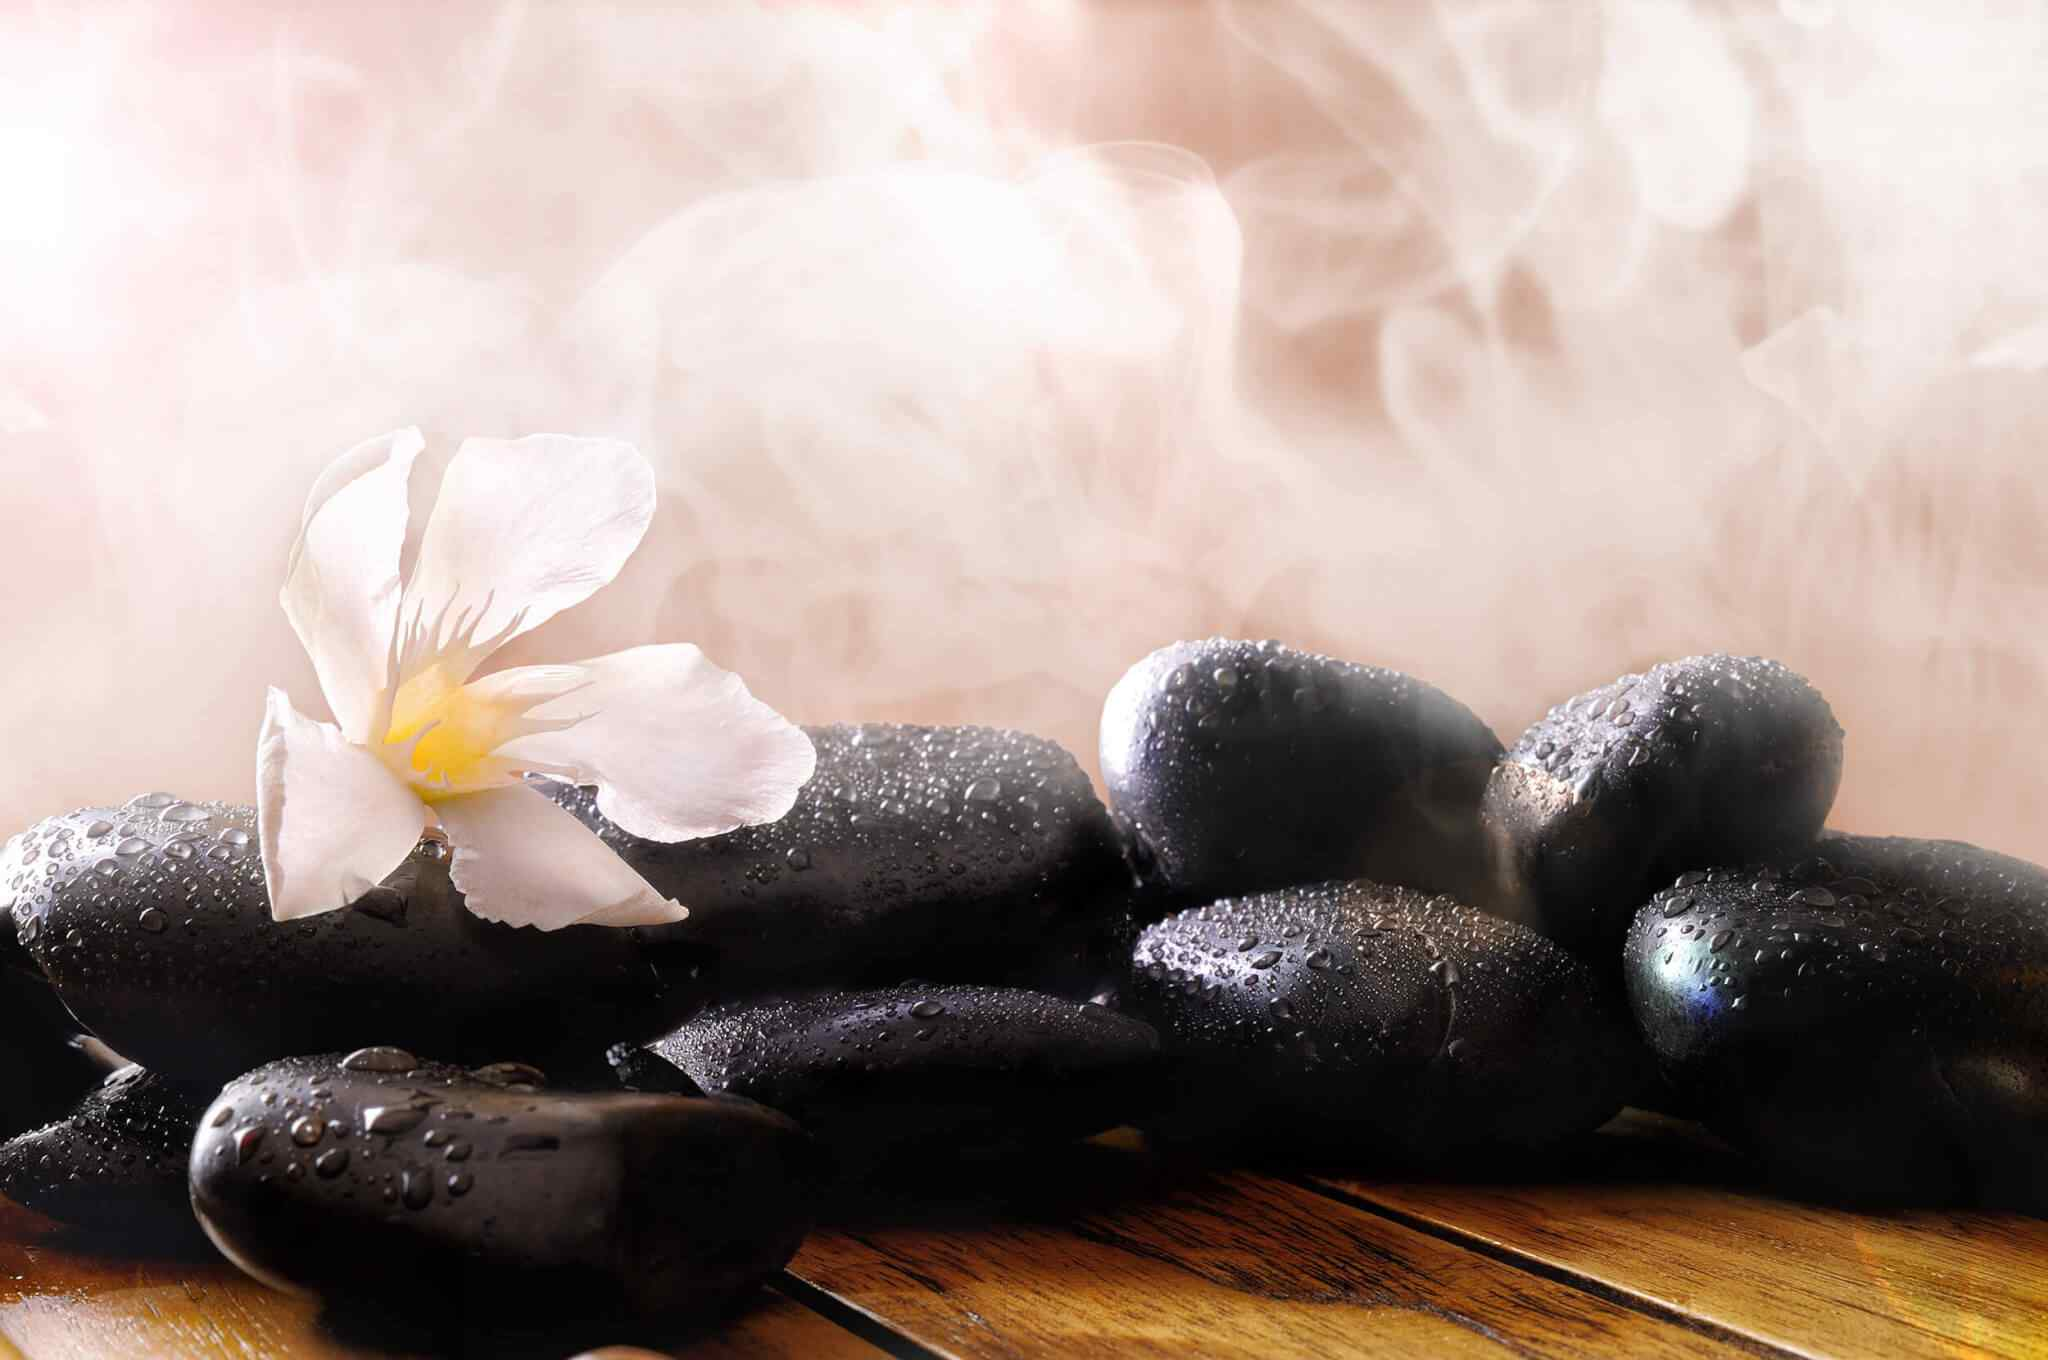 https://beauty-tuttlingen.de/wp-content/uploads/2018/11/spa-stone-massage-4.jpg